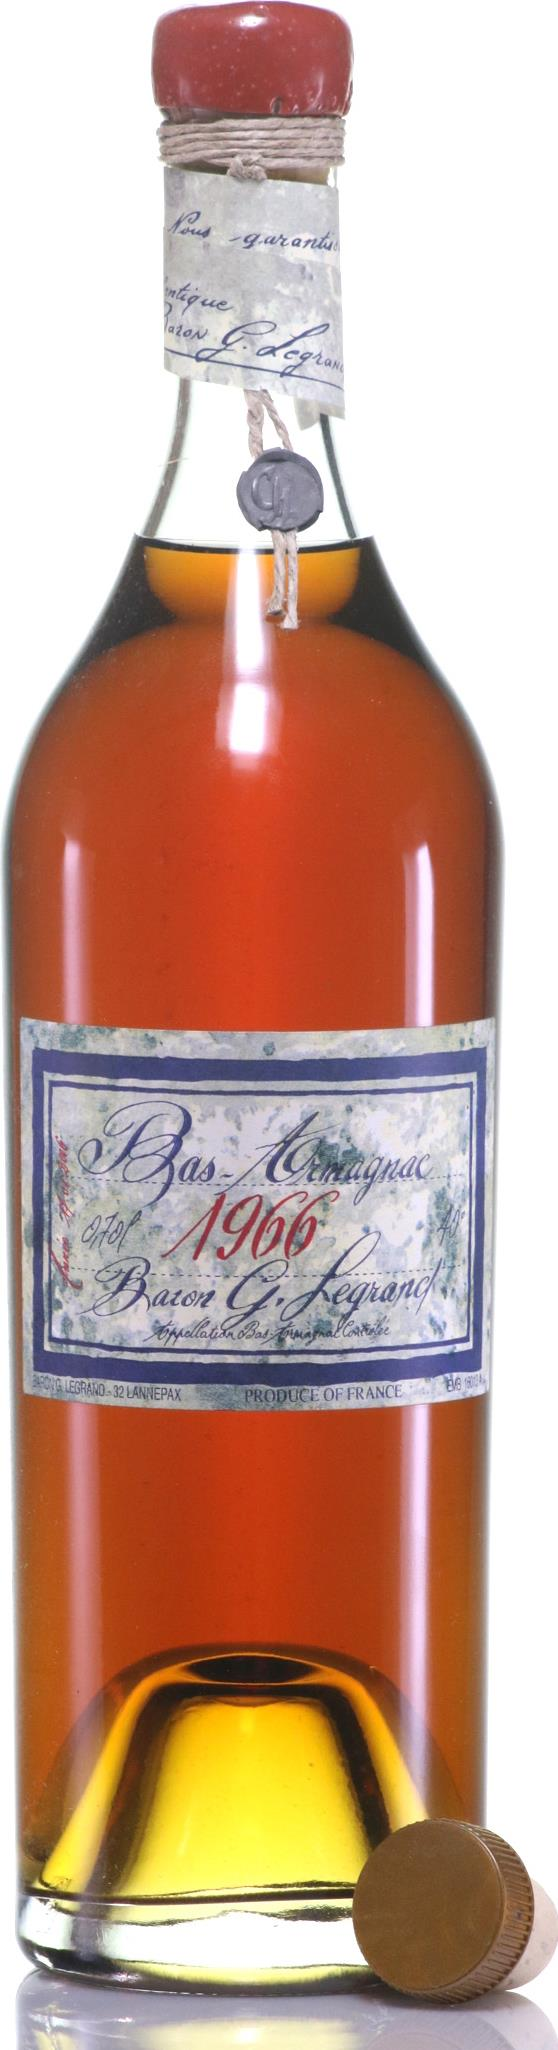 Armagnac 1966 Baron Gaston LeGrand